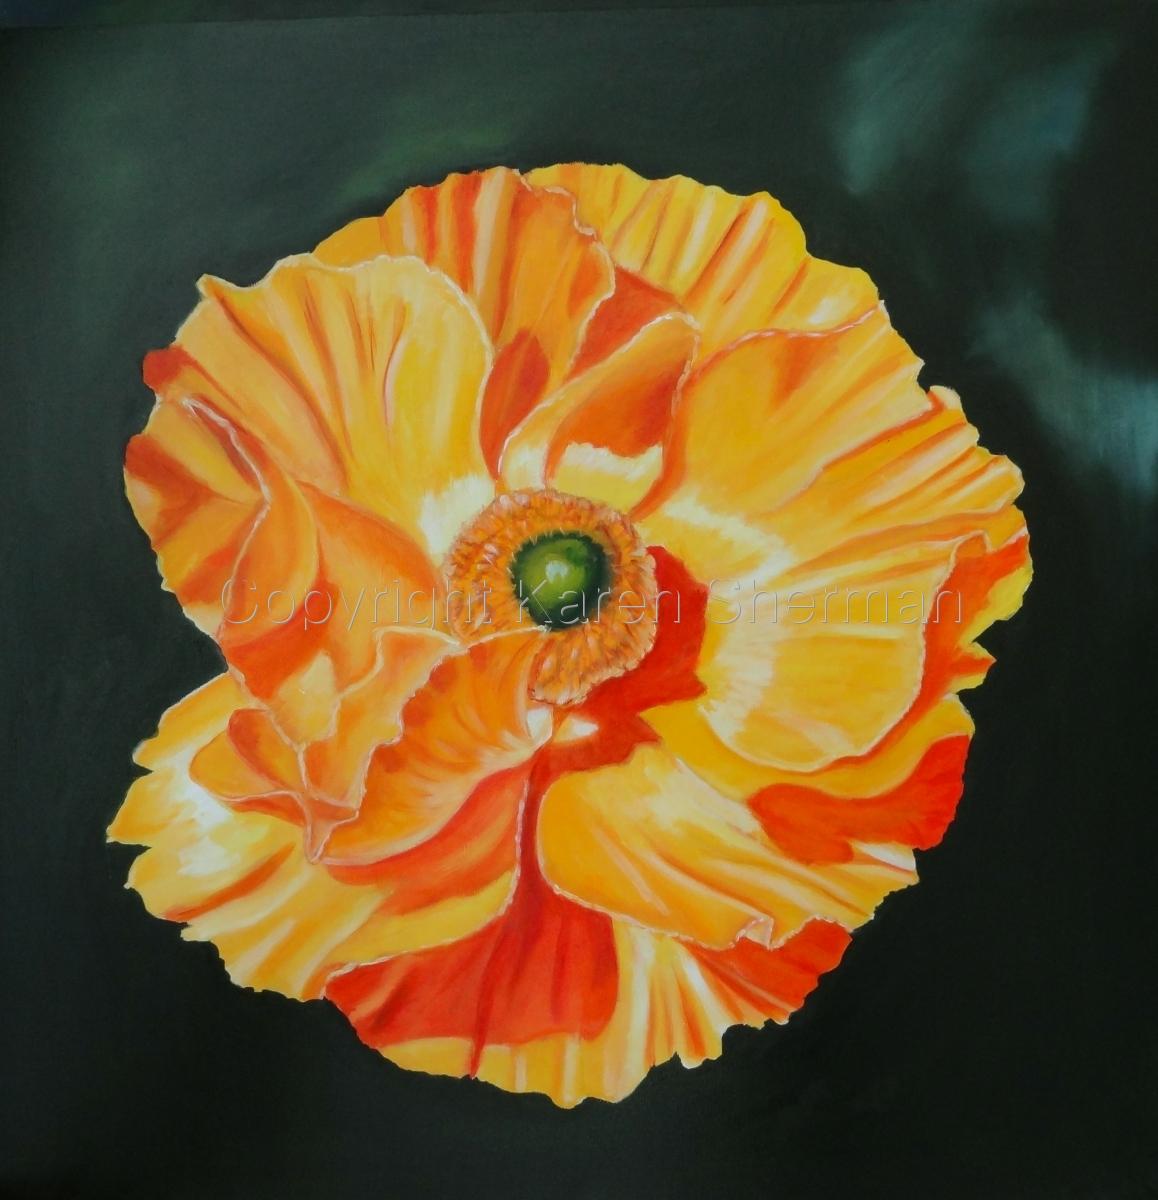 """Yellow Poppy"" (large view)"